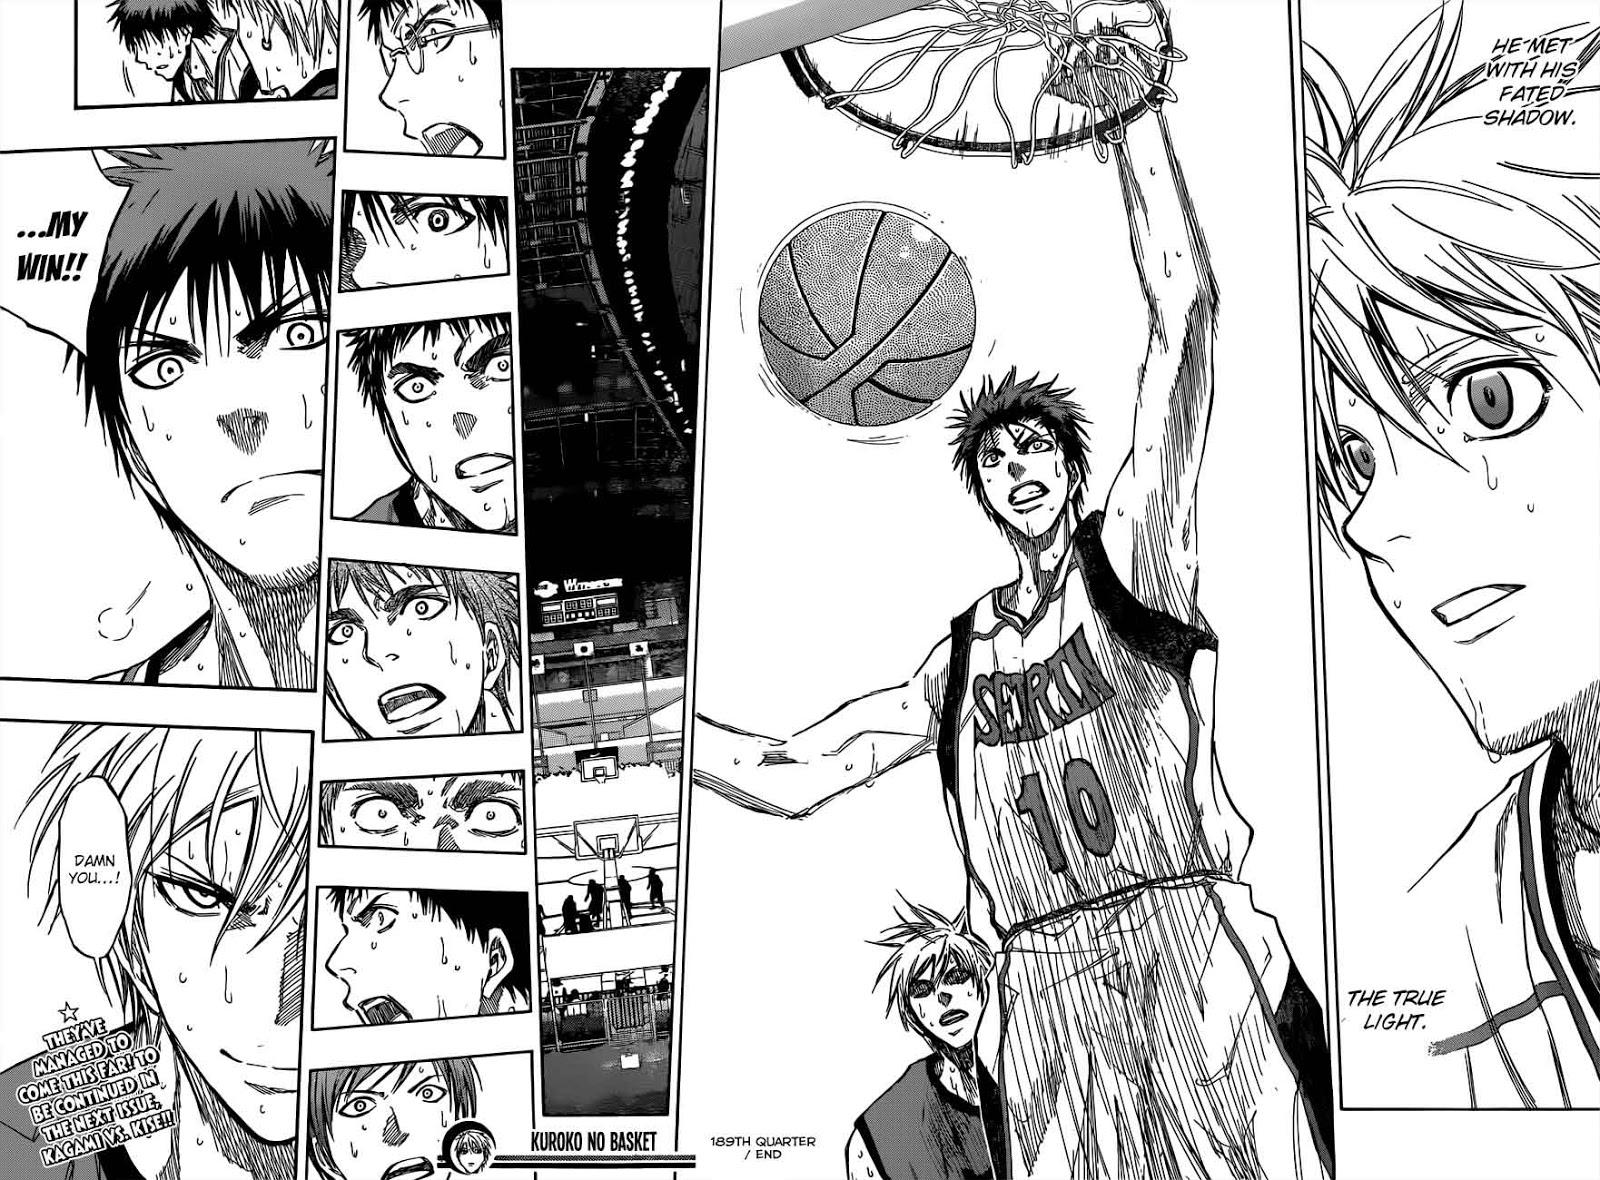 Kuroko no Basket Manga Chapter 189 - Image 18-19